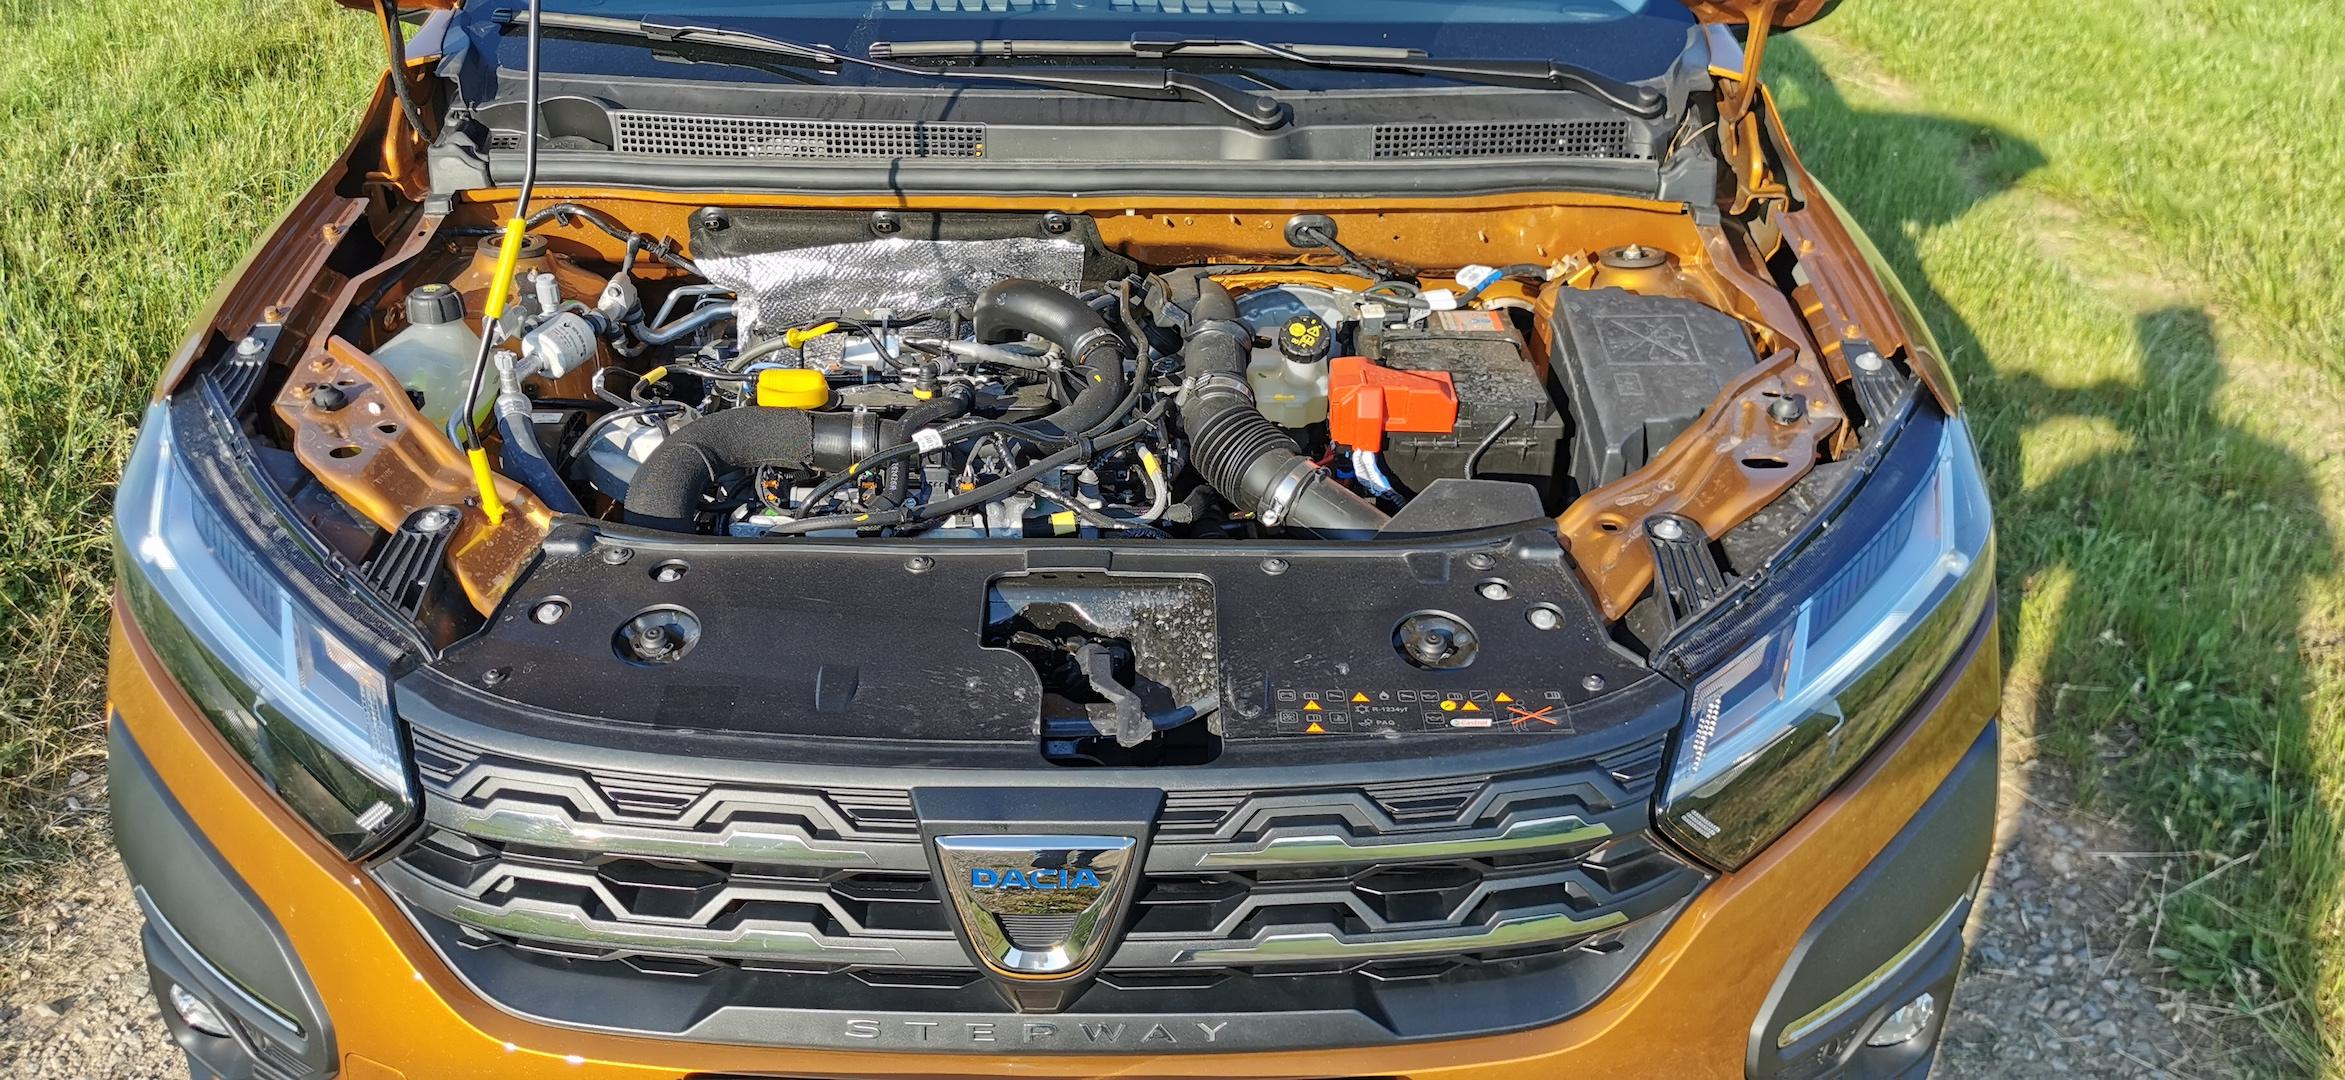 Dacia Sandero Stepway 1,0 TCe LPG - motor